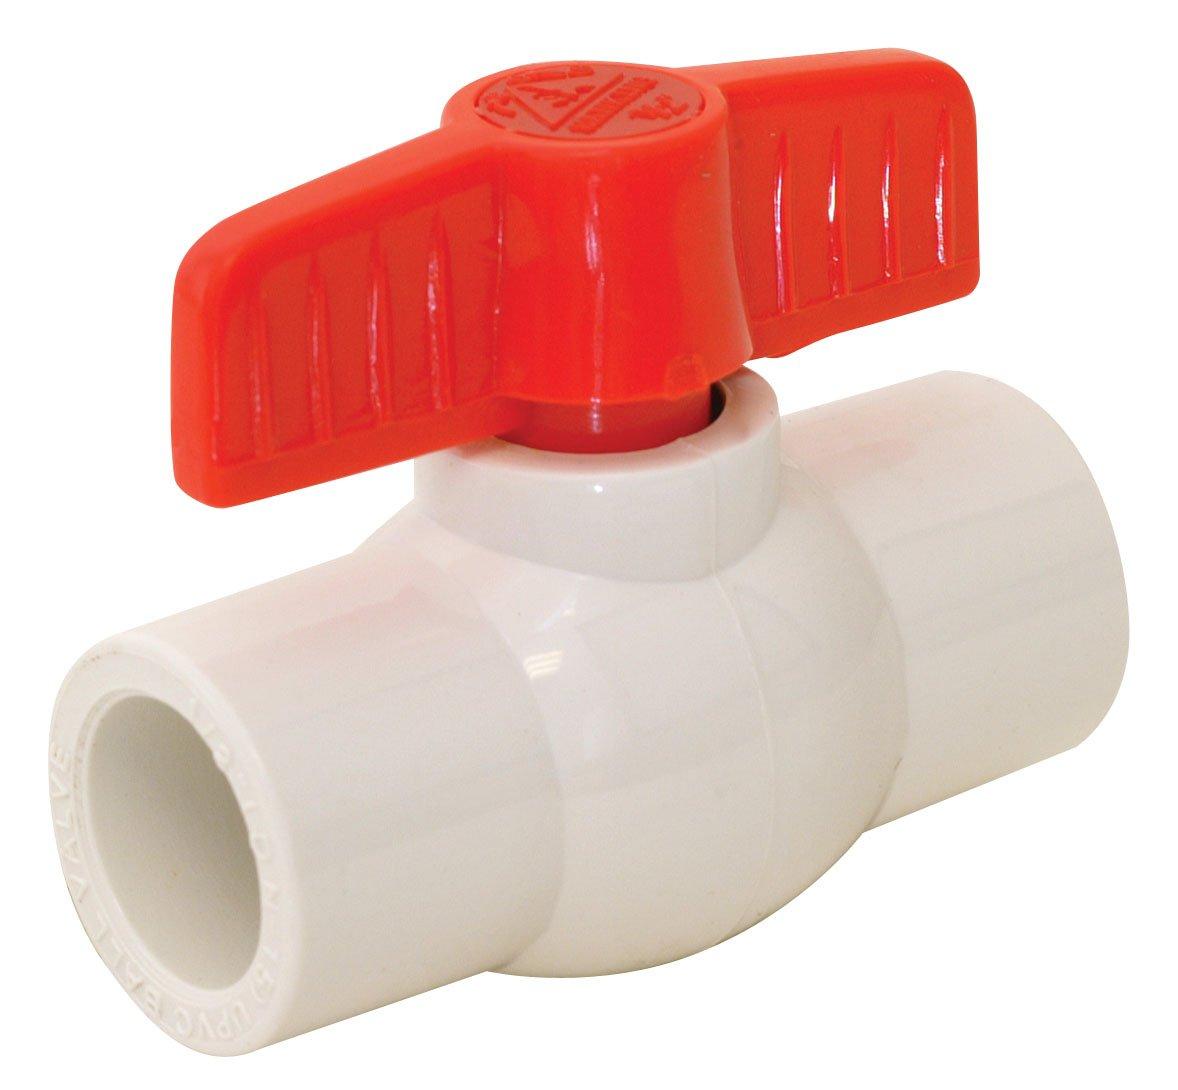 "EZ-FLO 20123 slip ball valve pvc, 3"", White"